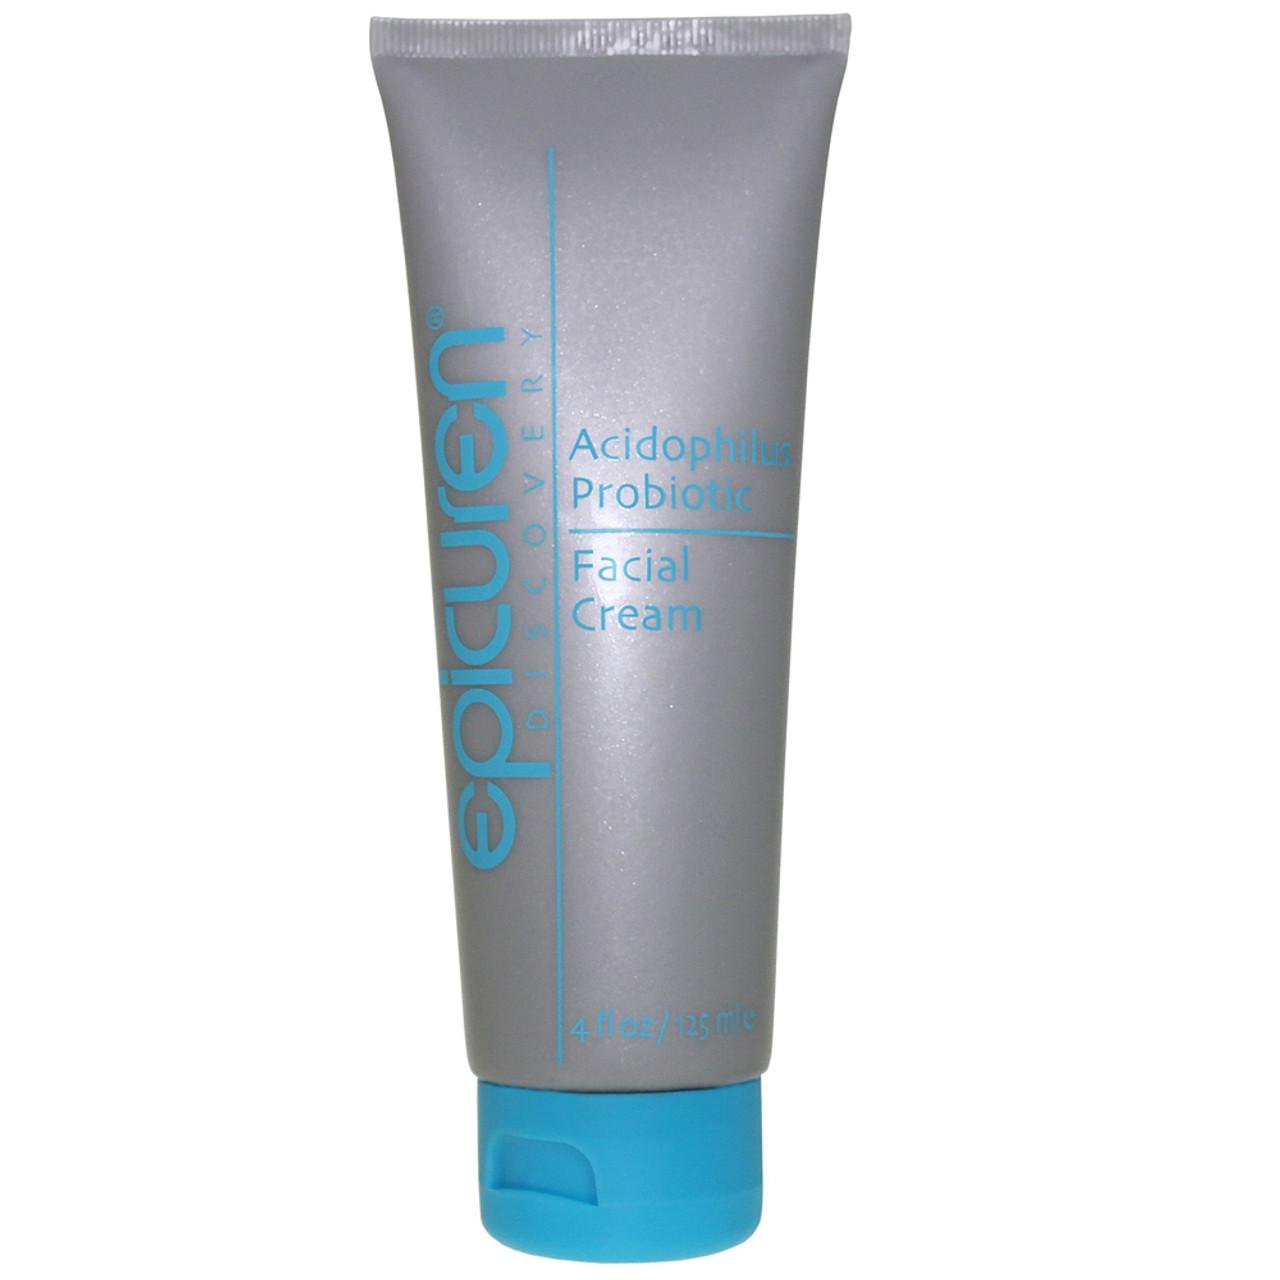 epicuren Discovery Acidophilus Probiotic Facial Cream 2.5 oz